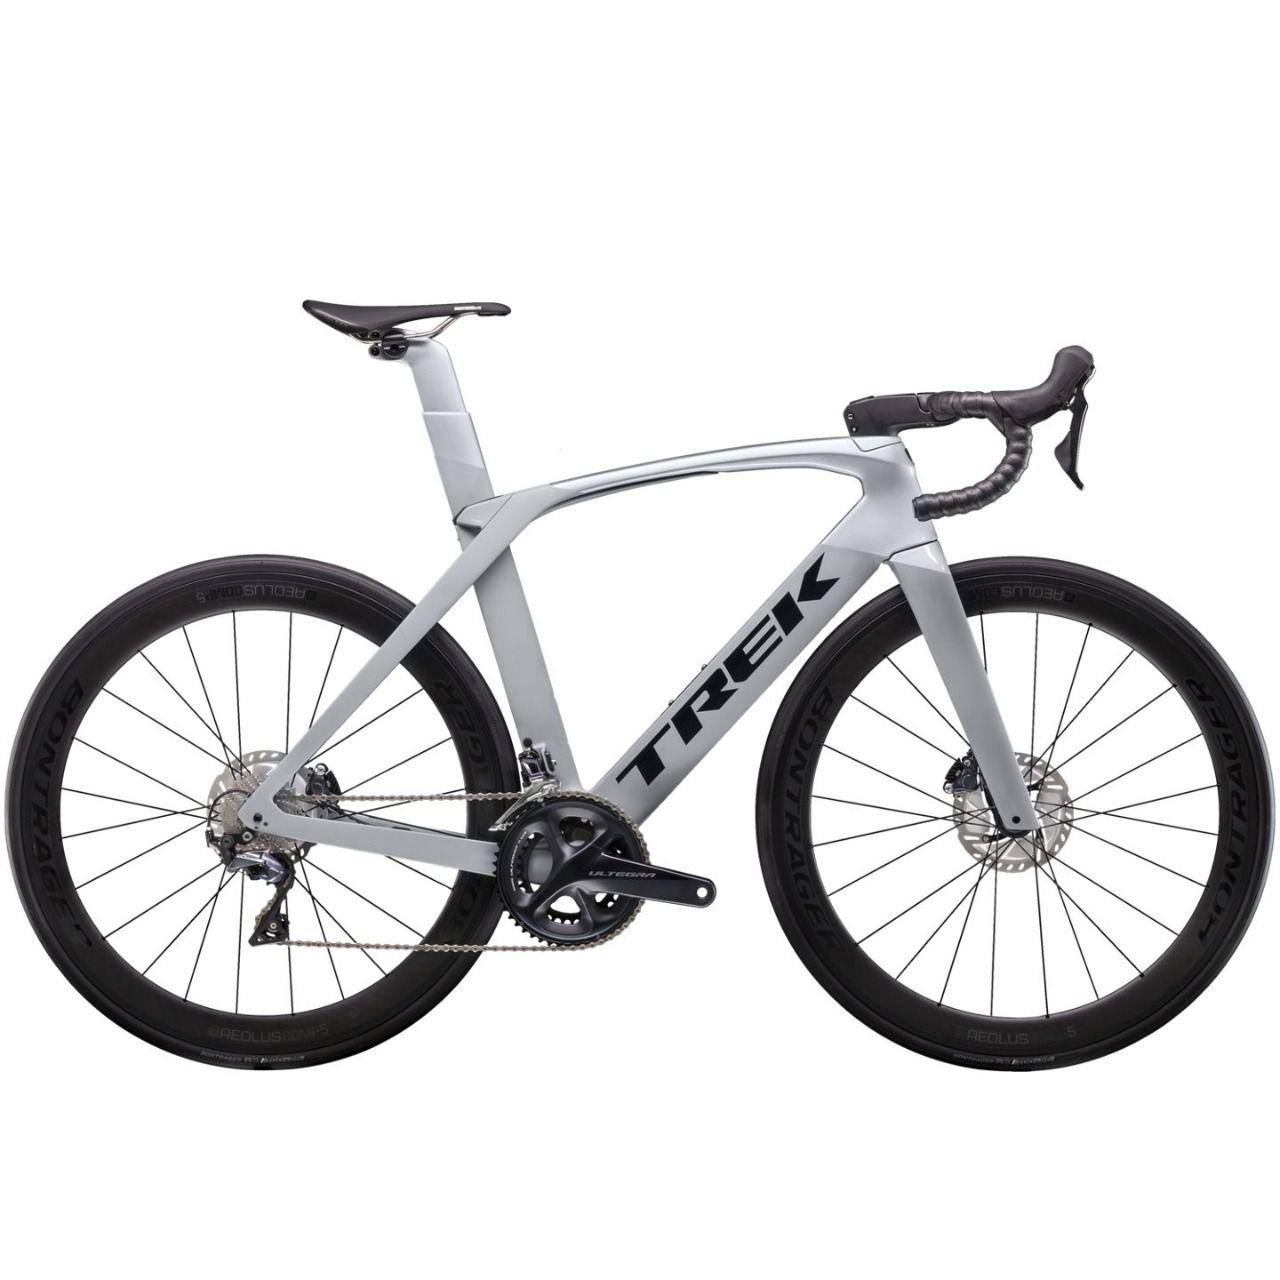 Bicicleta Trek Madone SLR 6 Disc - 2019 - R$39.999,00